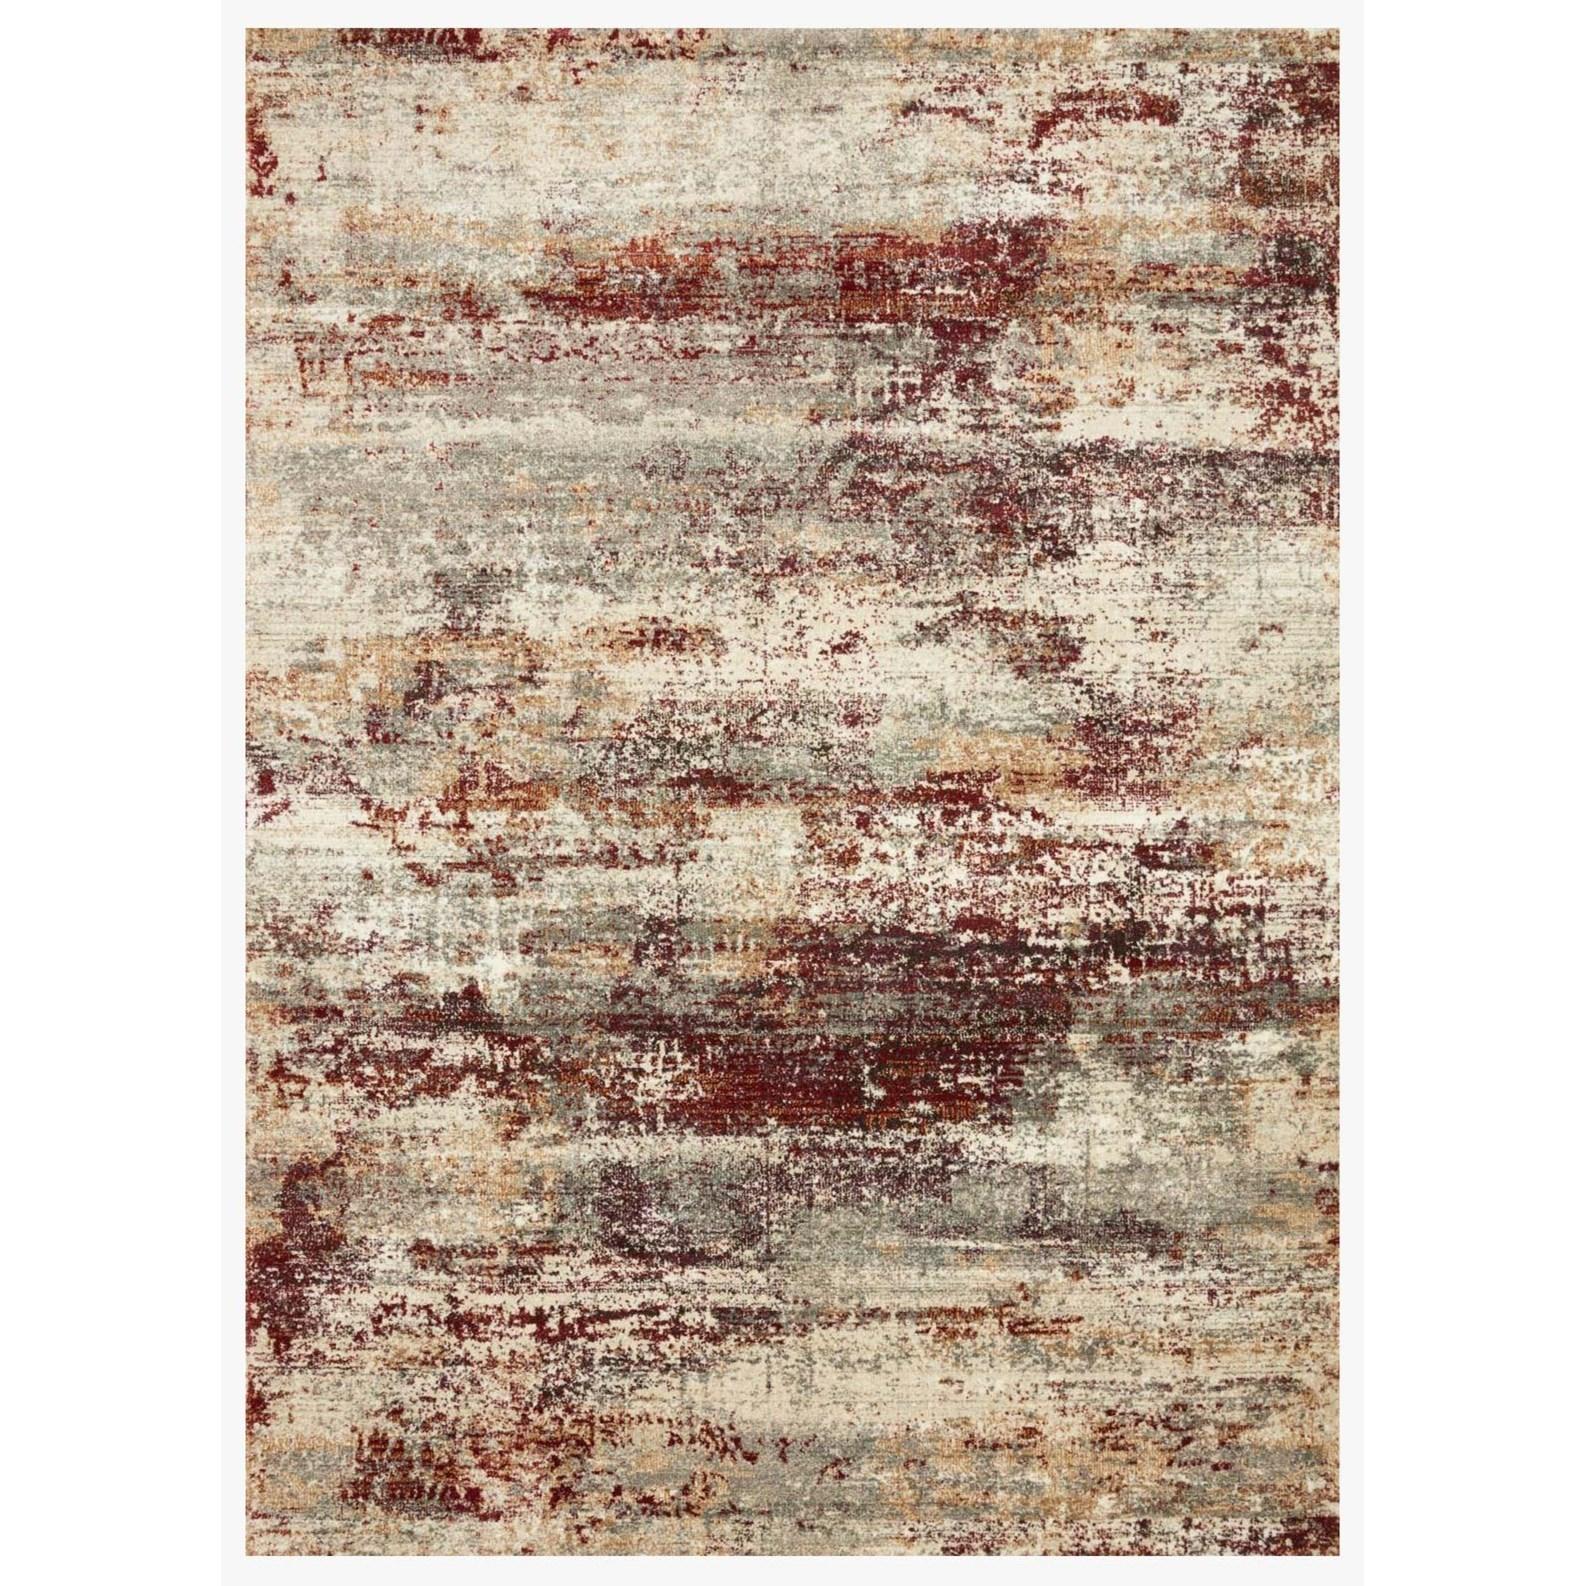 "Jasmine 9'6"" x 13' Dove / Rust Rug by Loloi Rugs at Virginia Furniture Market"